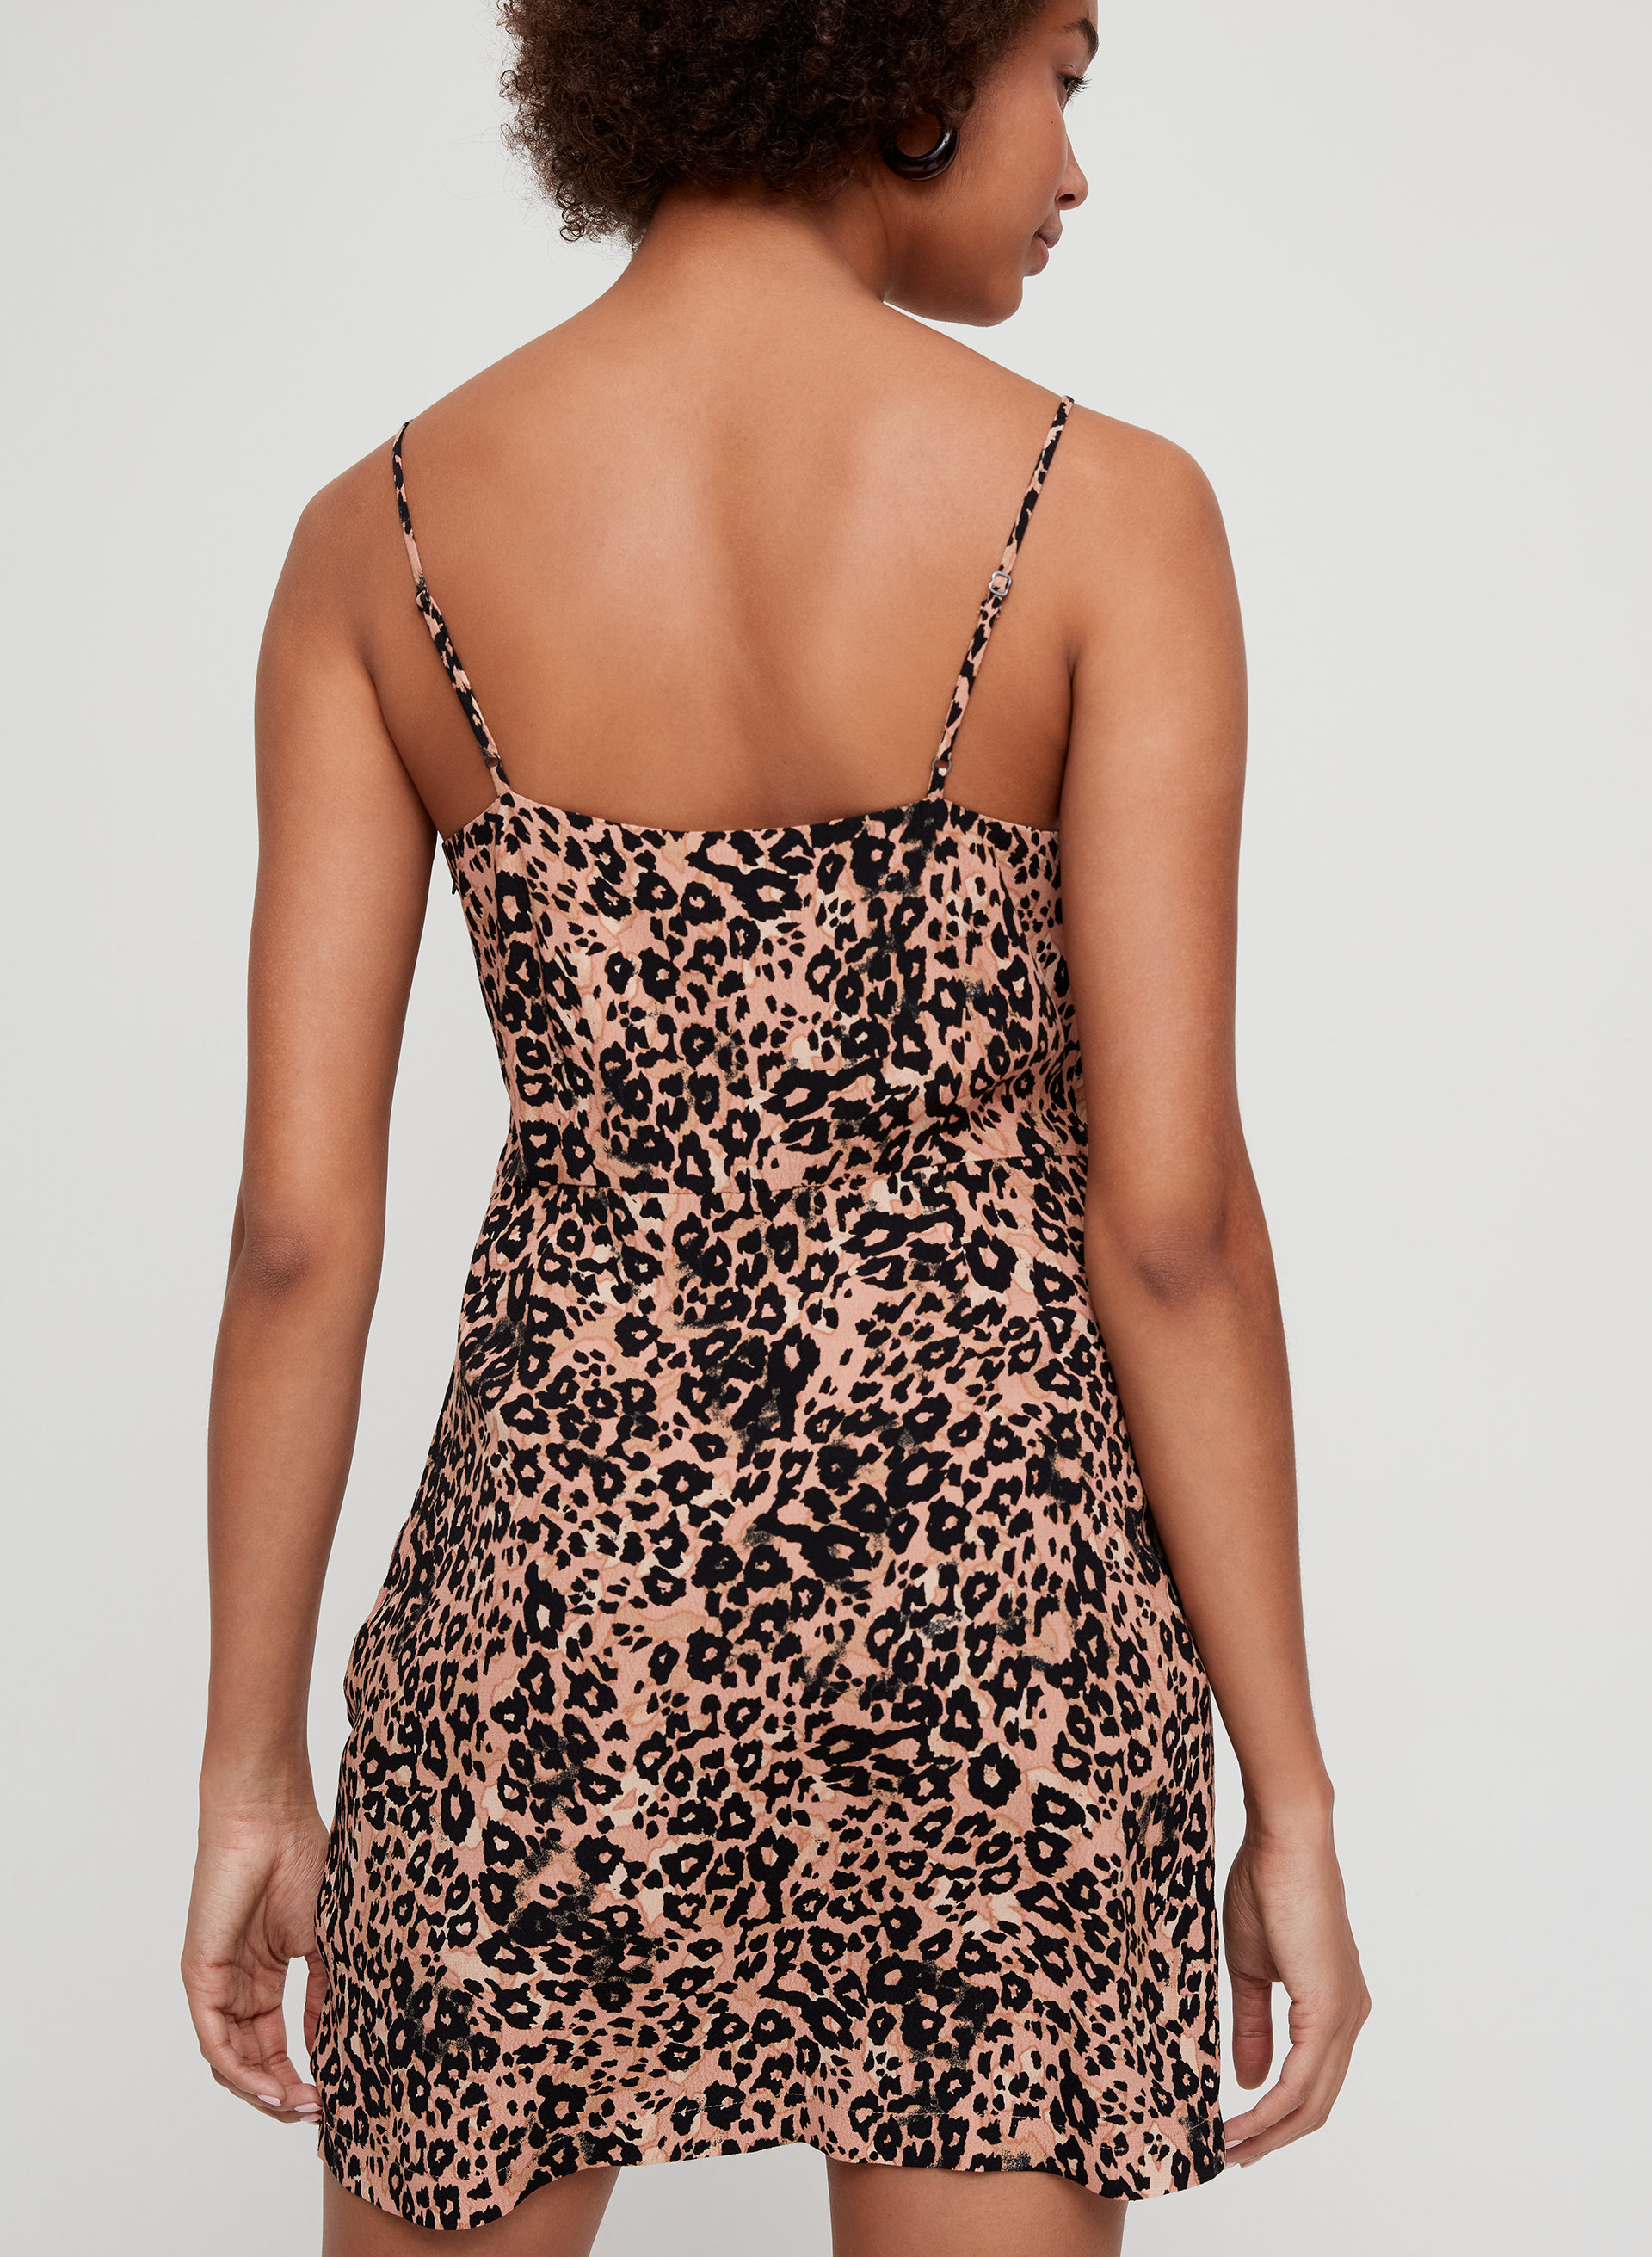 Leopard Mini Dress from the 90s